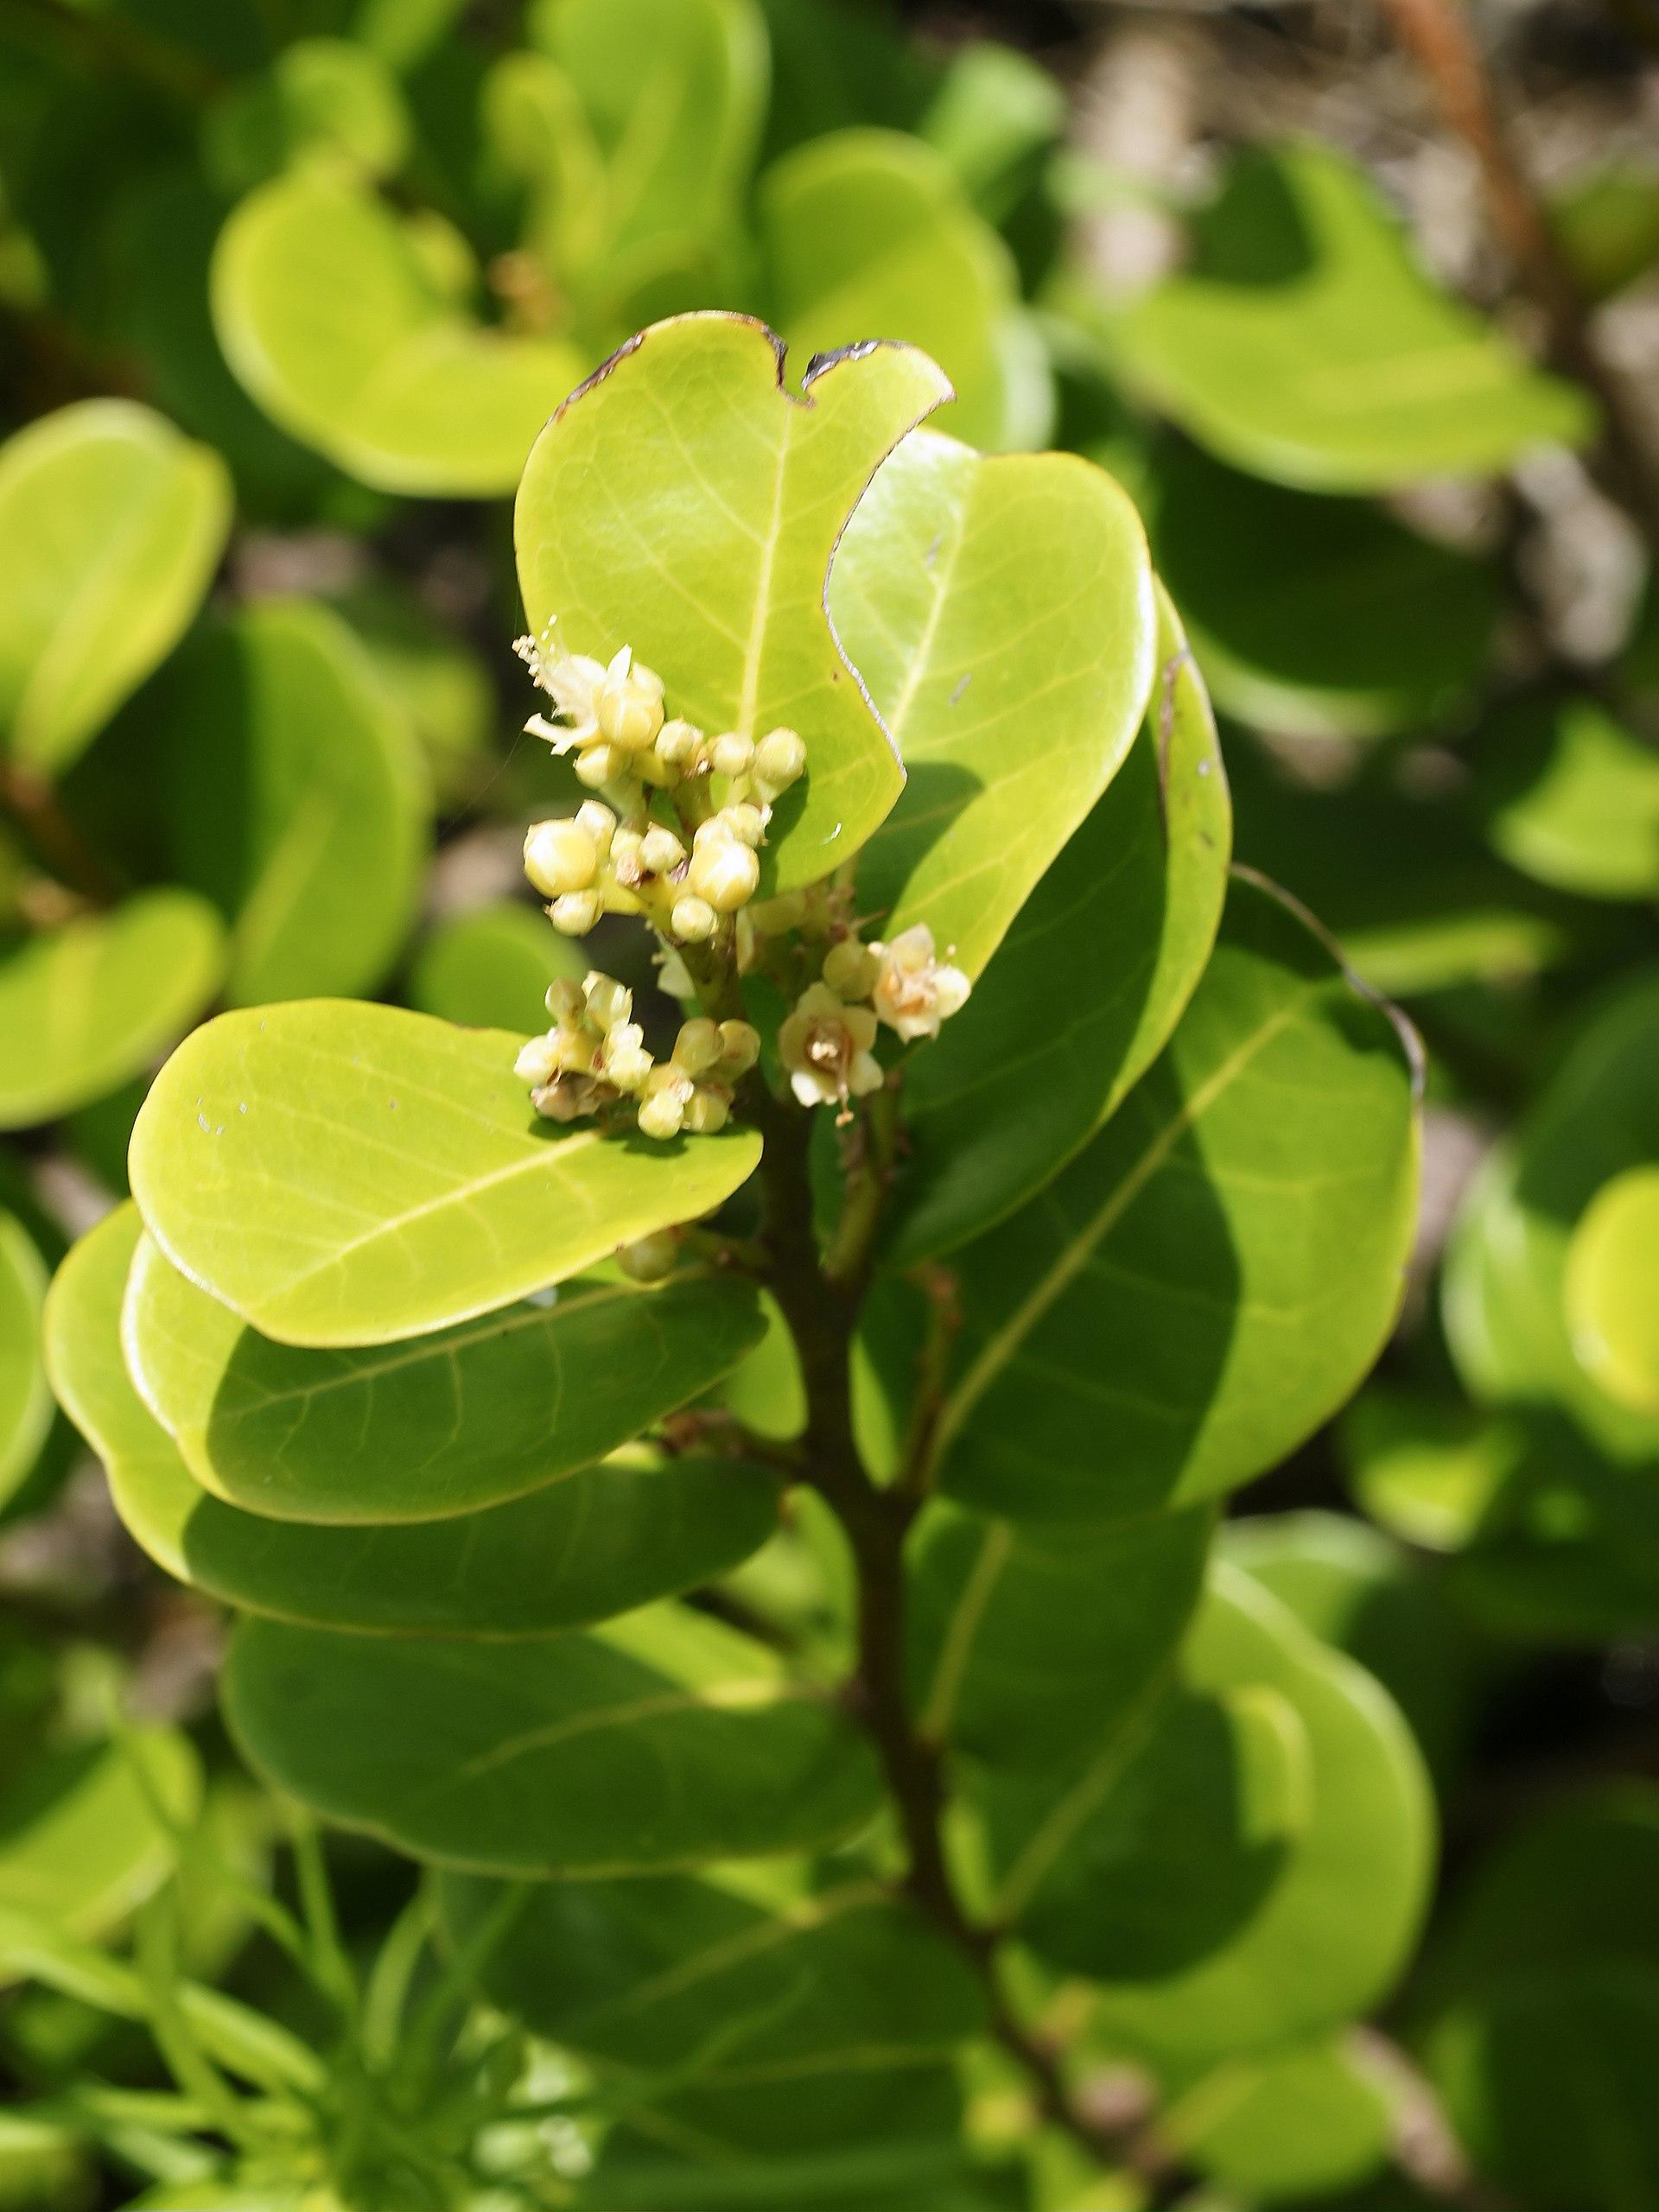 Chrysobalanus icaco wikipedia for Plantas ornamentales wikipedia